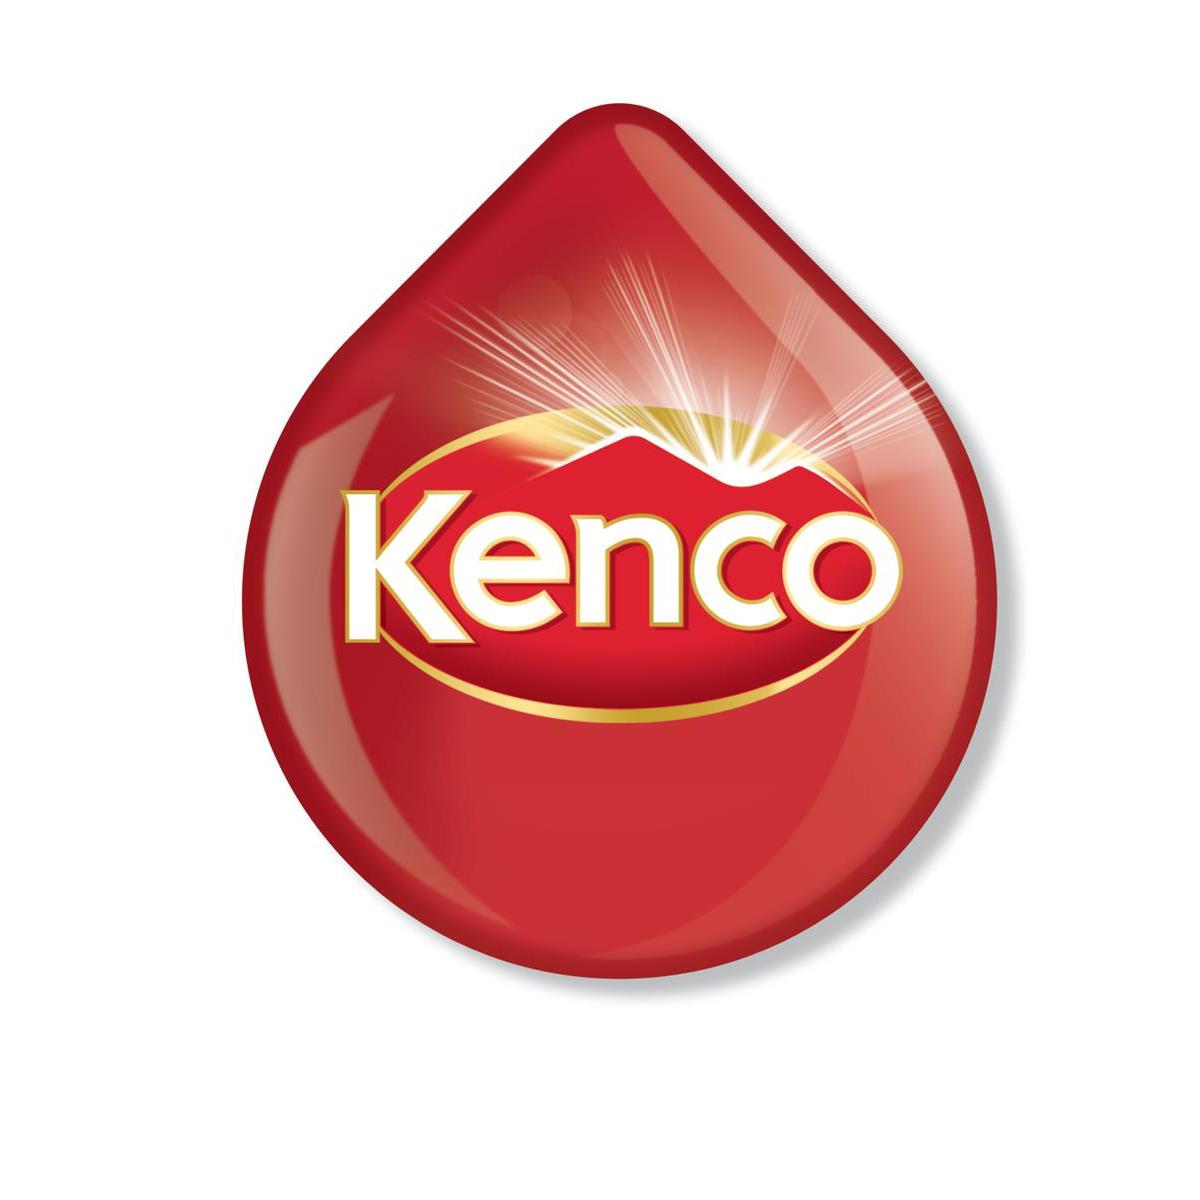 Tassimo Kenco Americano Grande XL Pods 16 Servings Per Pack Ref 4031640 Pack 5 x 16